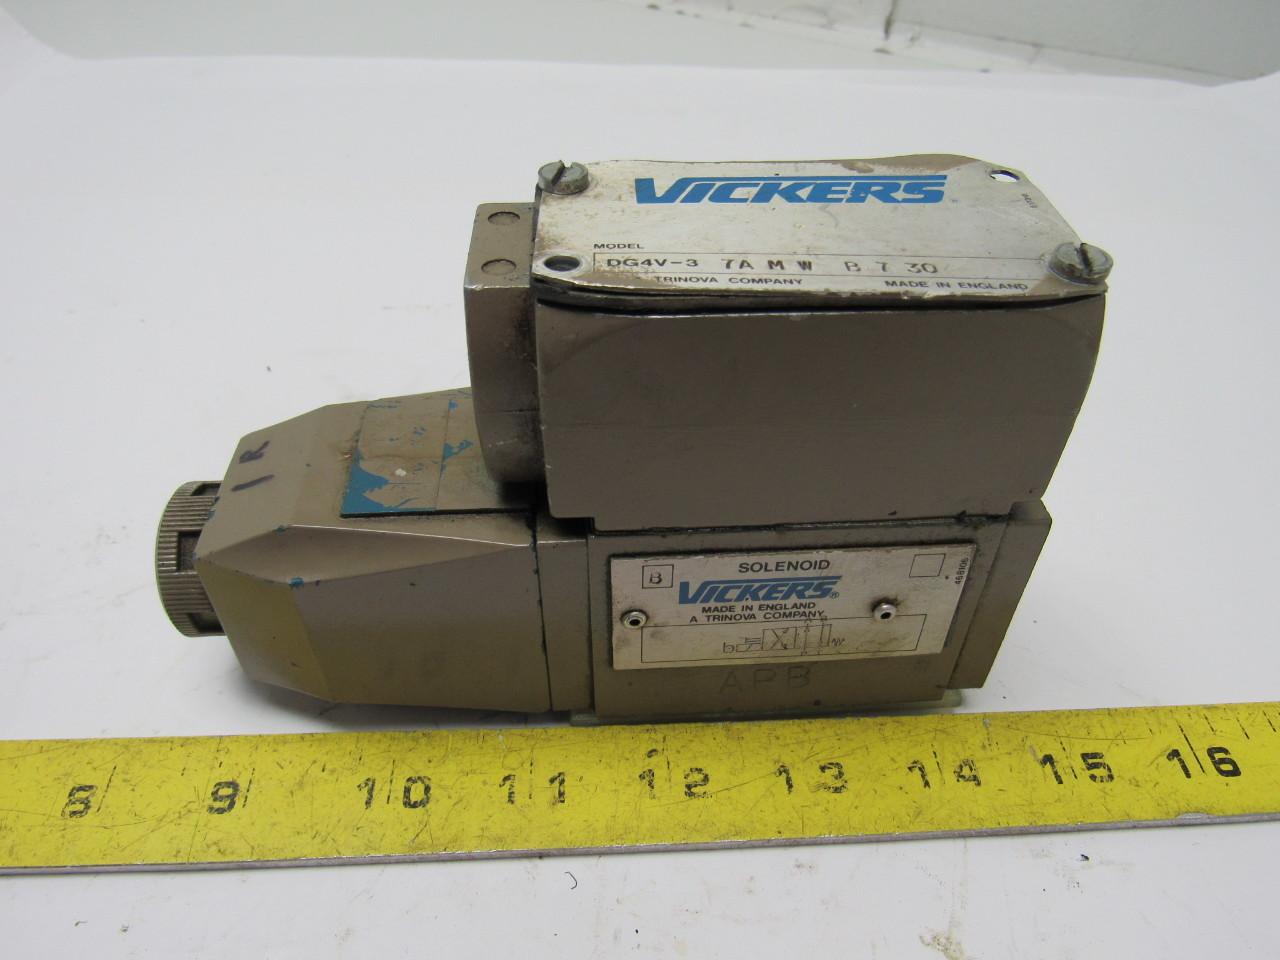 Vickers DG4V-3-7A-M-W-B-7-30 Hydraulic Solenoid Valve 110V Coil 3000PSI